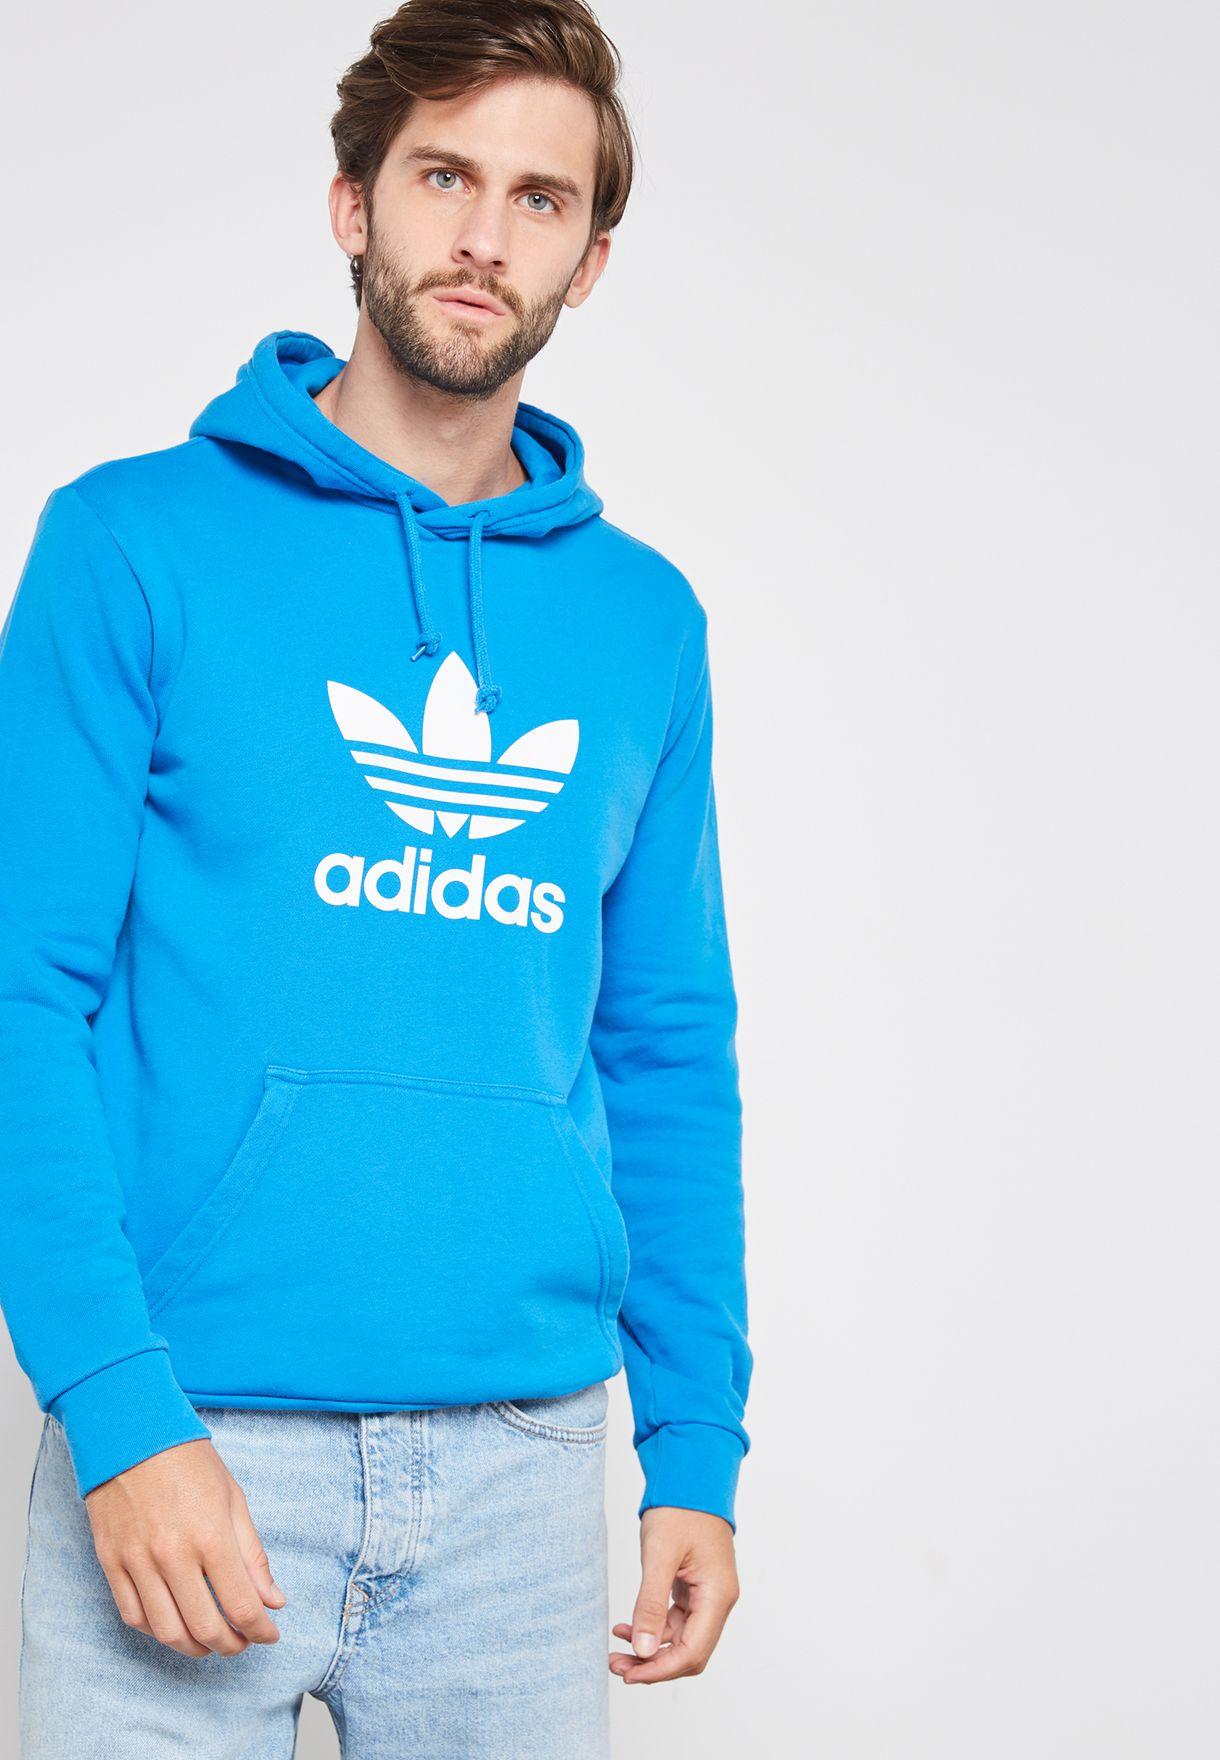 a3b25778a1b8 Shop adidas Originals blue Trefoil Hoodie DT7965 for Men in UAE ...